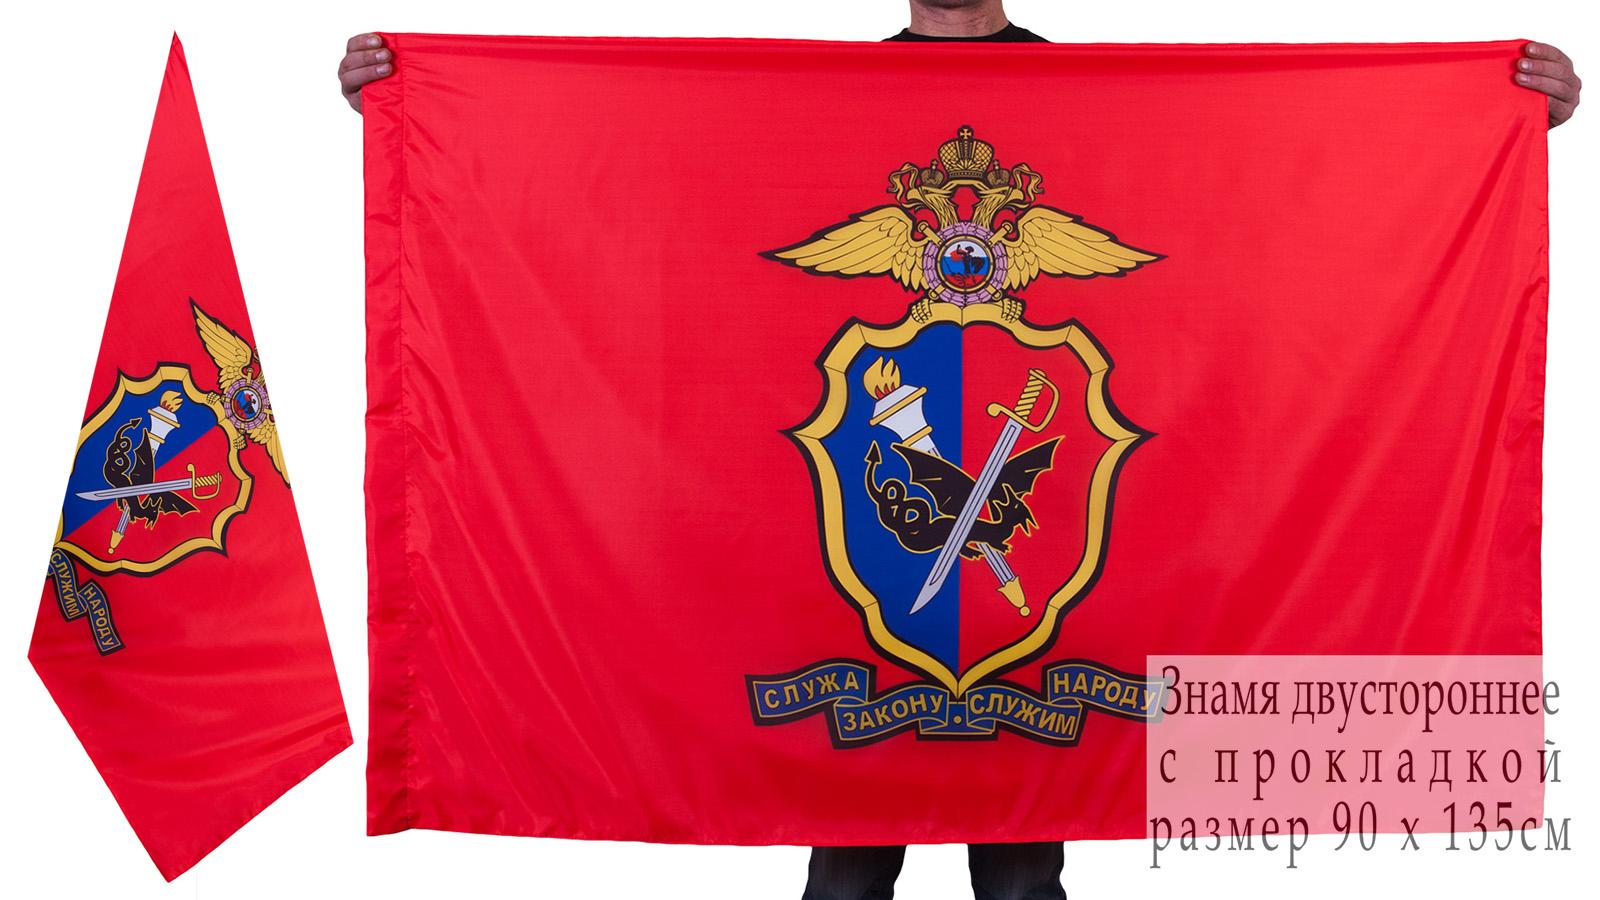 Знамя Уголовного розыска